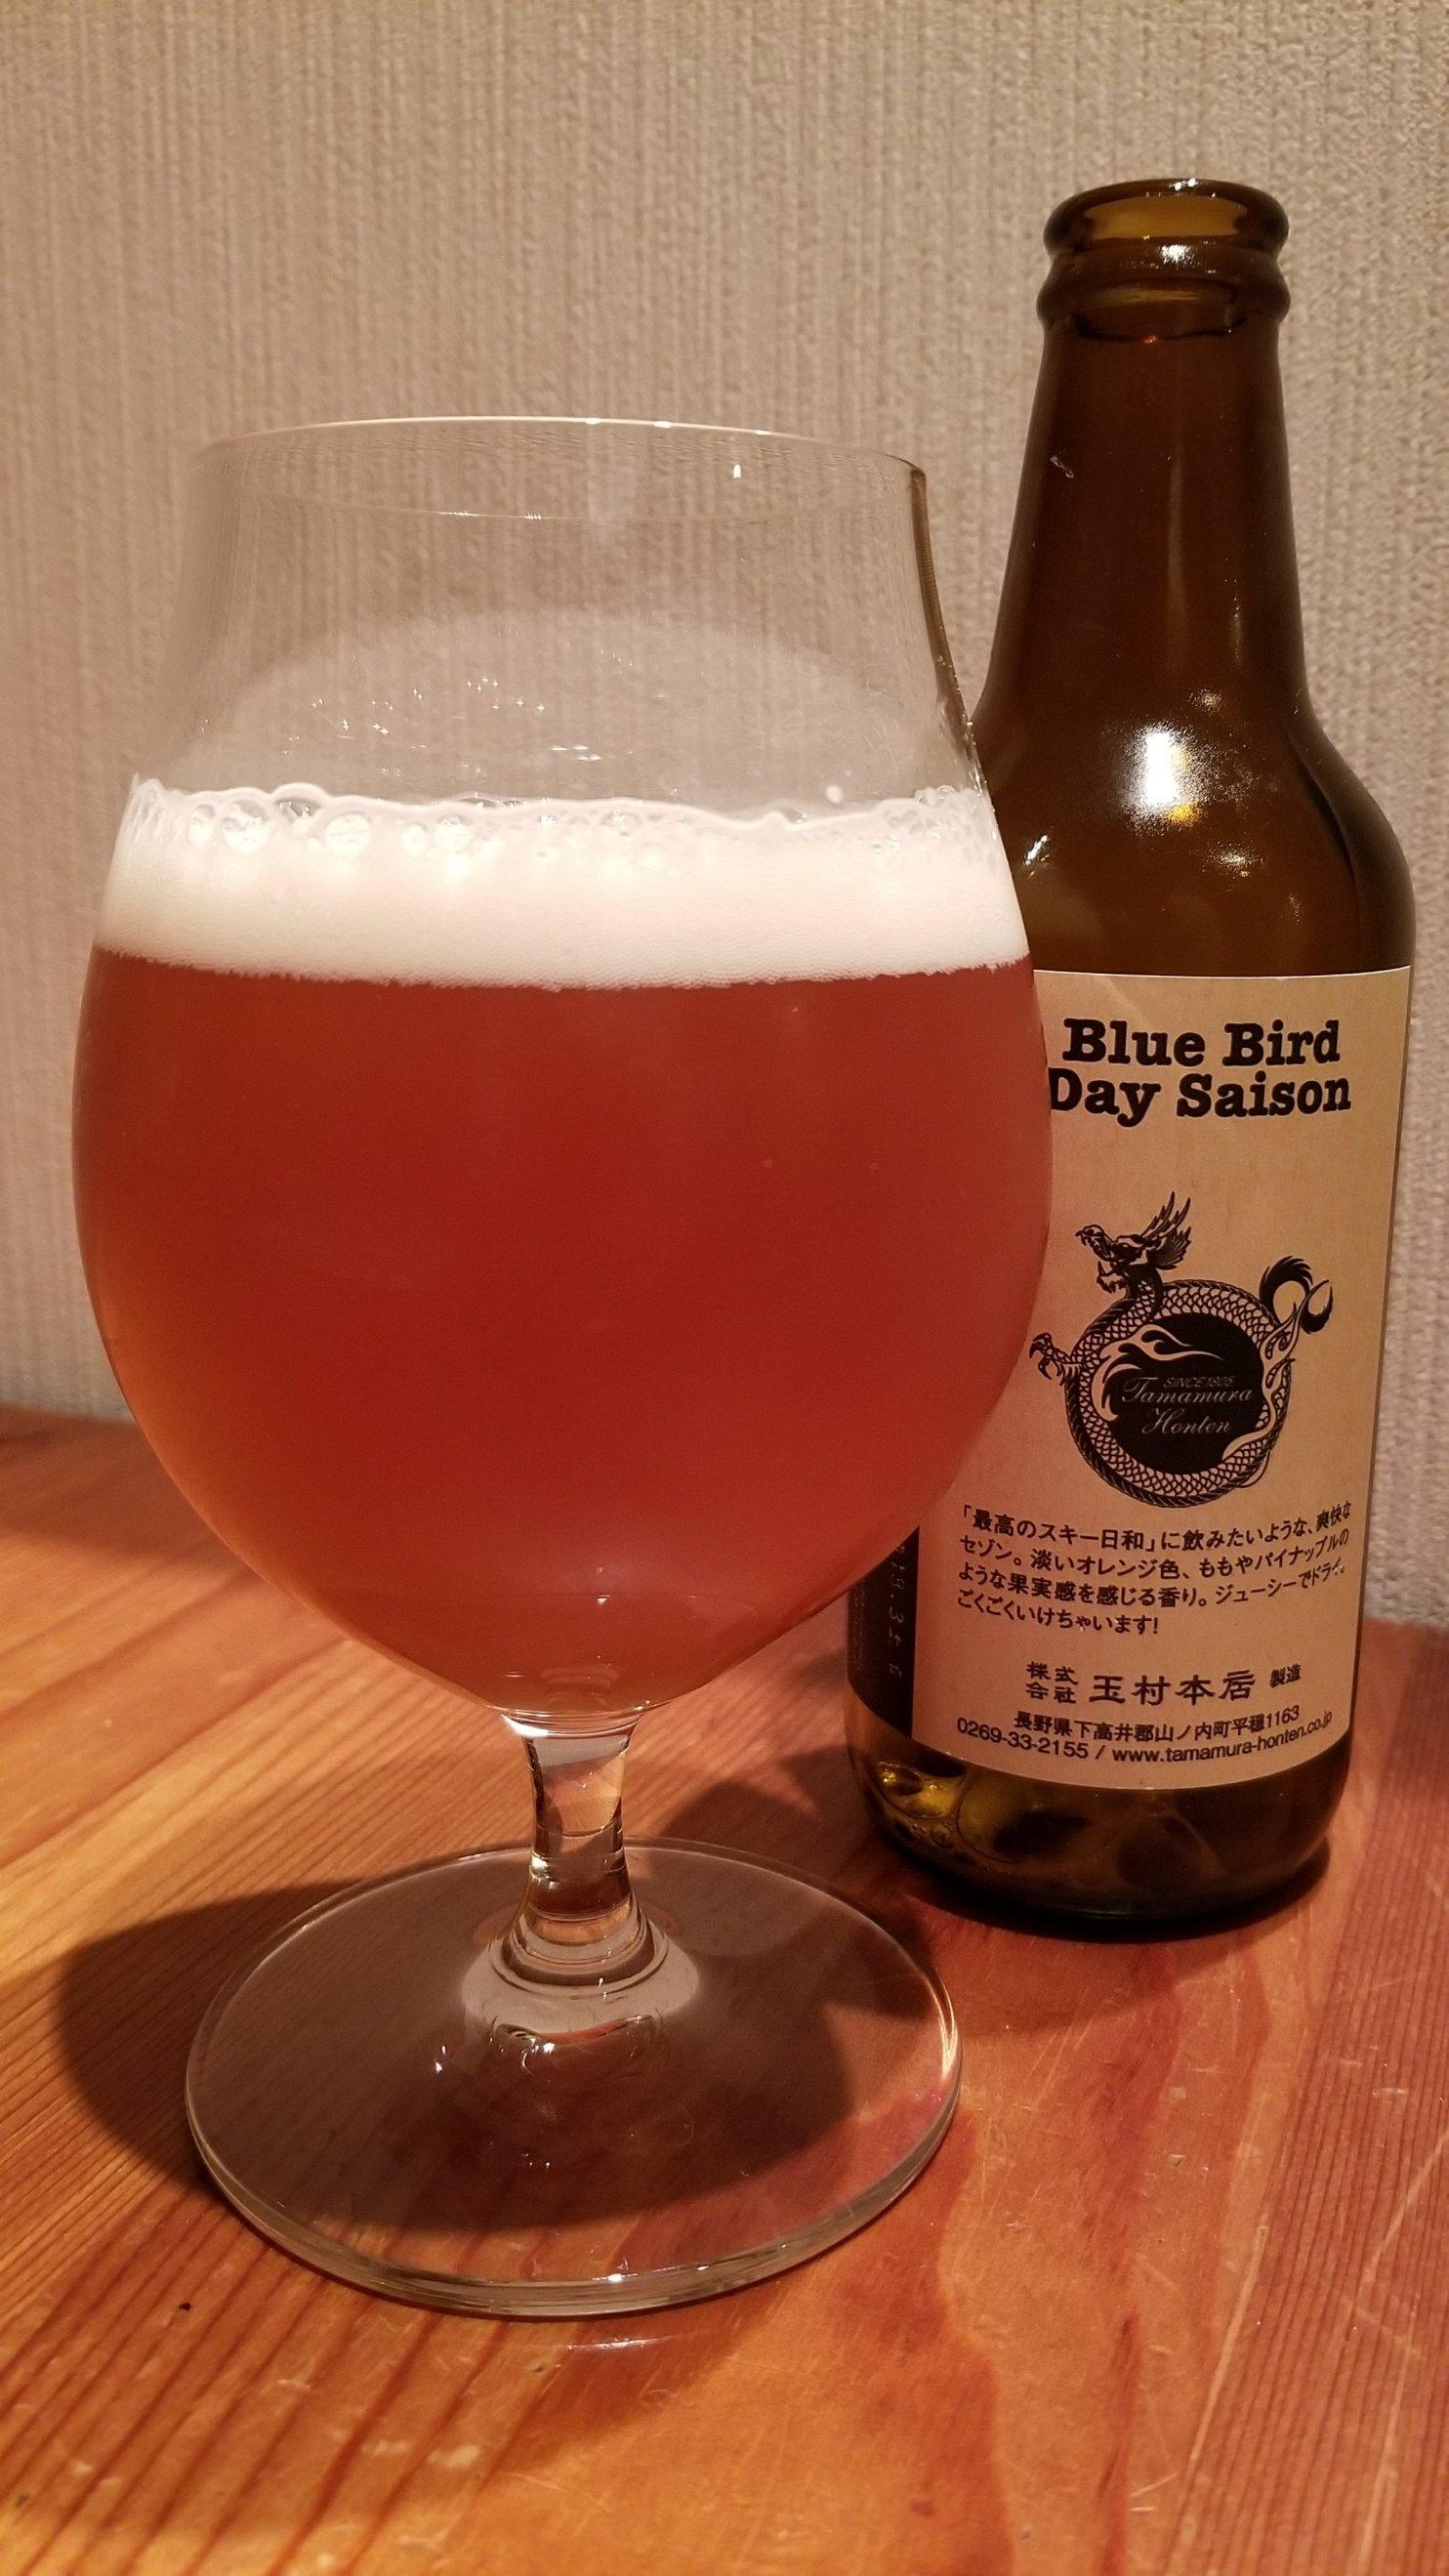 Shiga Kogen Blue Bird Day Saison 志賀高原ブルーバードディセゾン